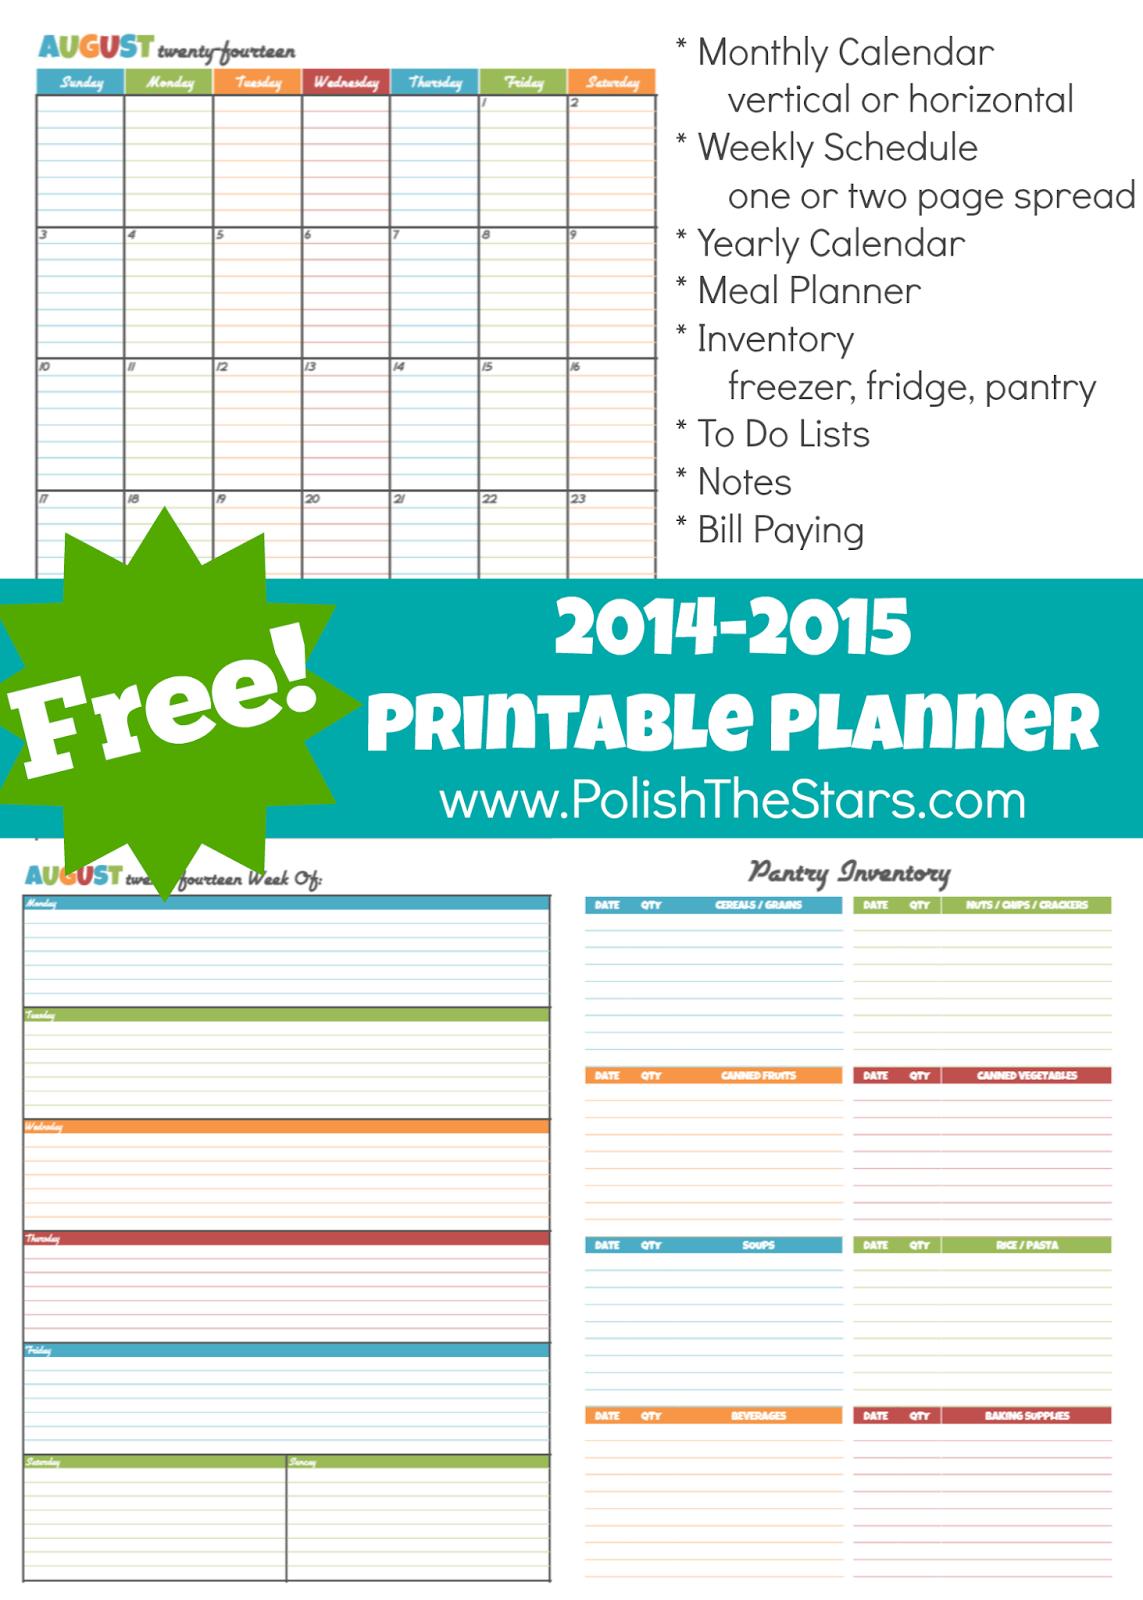 Free+2014-2015+Printable+Calendar.png (1143×1600)